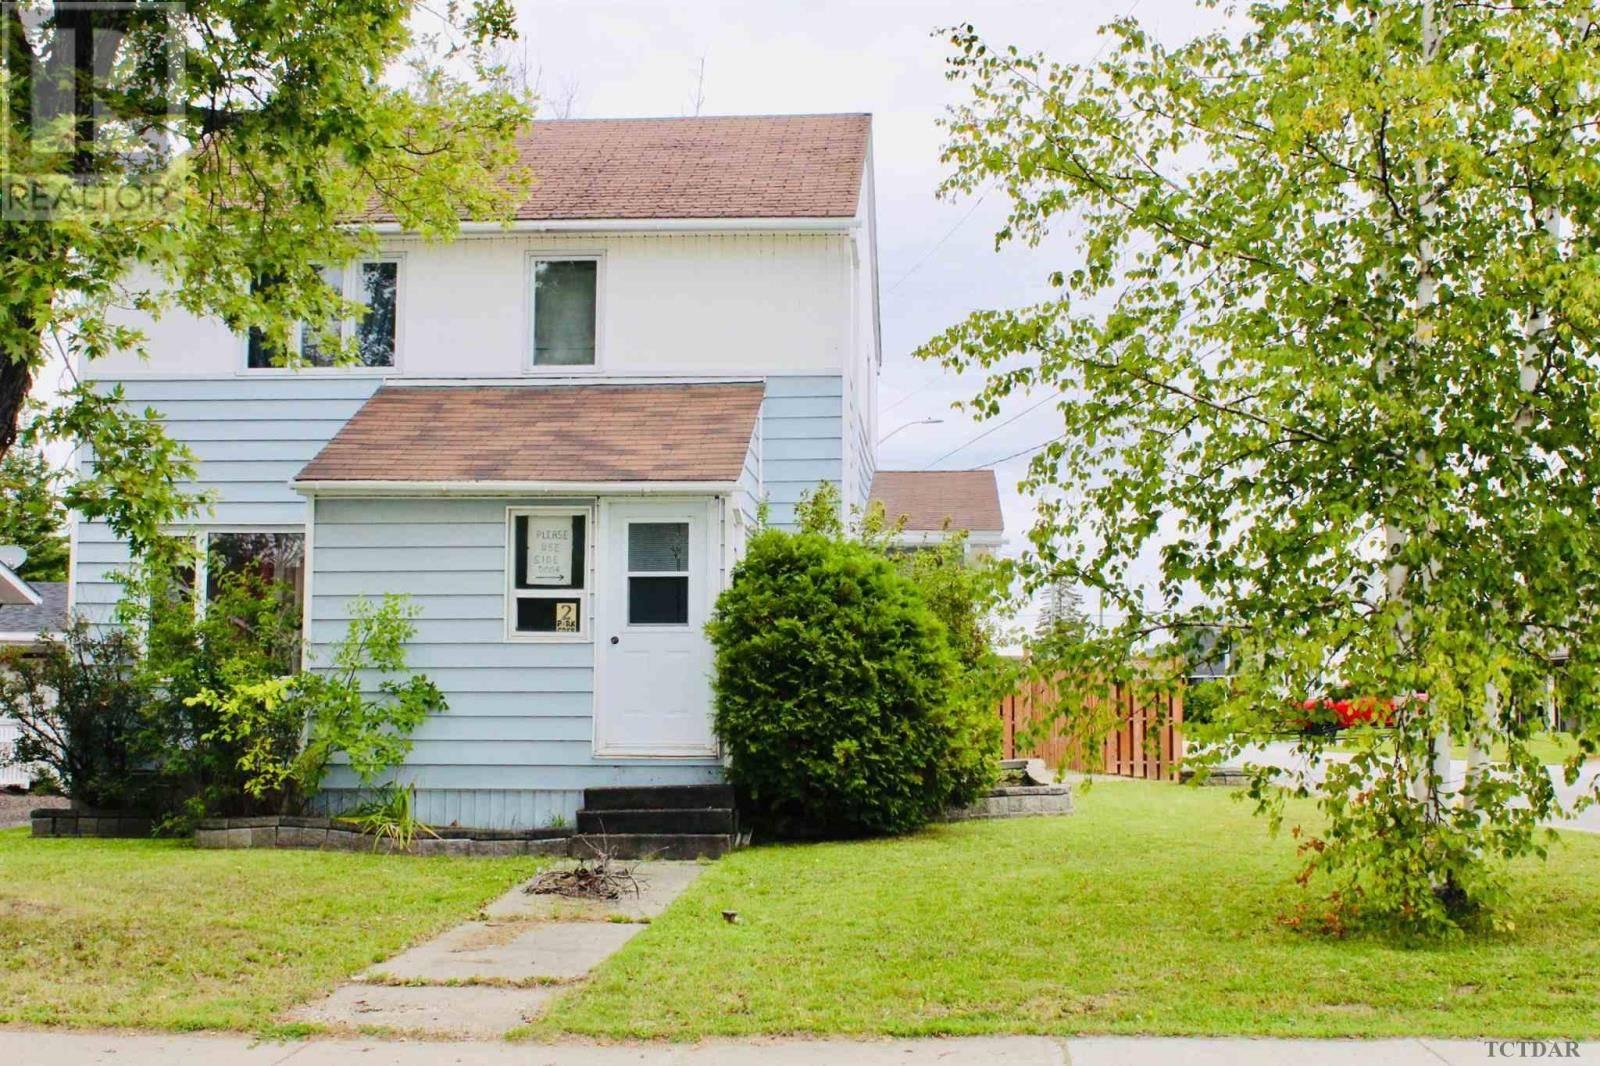 House for sale at 2 Park Cres Kapuskasing Ontario - MLS: TM192140